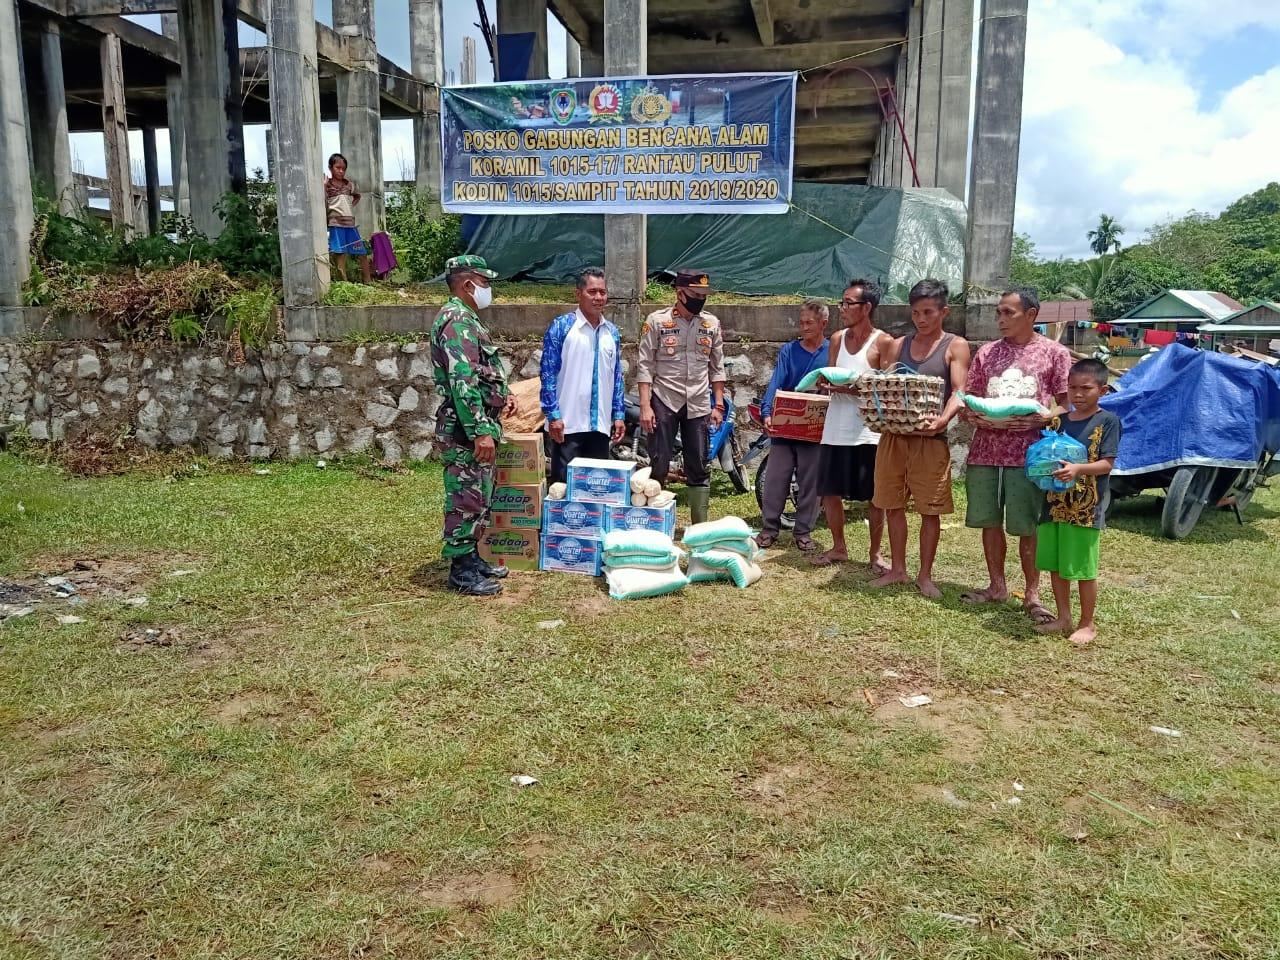 Sinergi Tiga Pilar, Bantu Warga Korban Bajir Kecamatan Seruyan Tengah